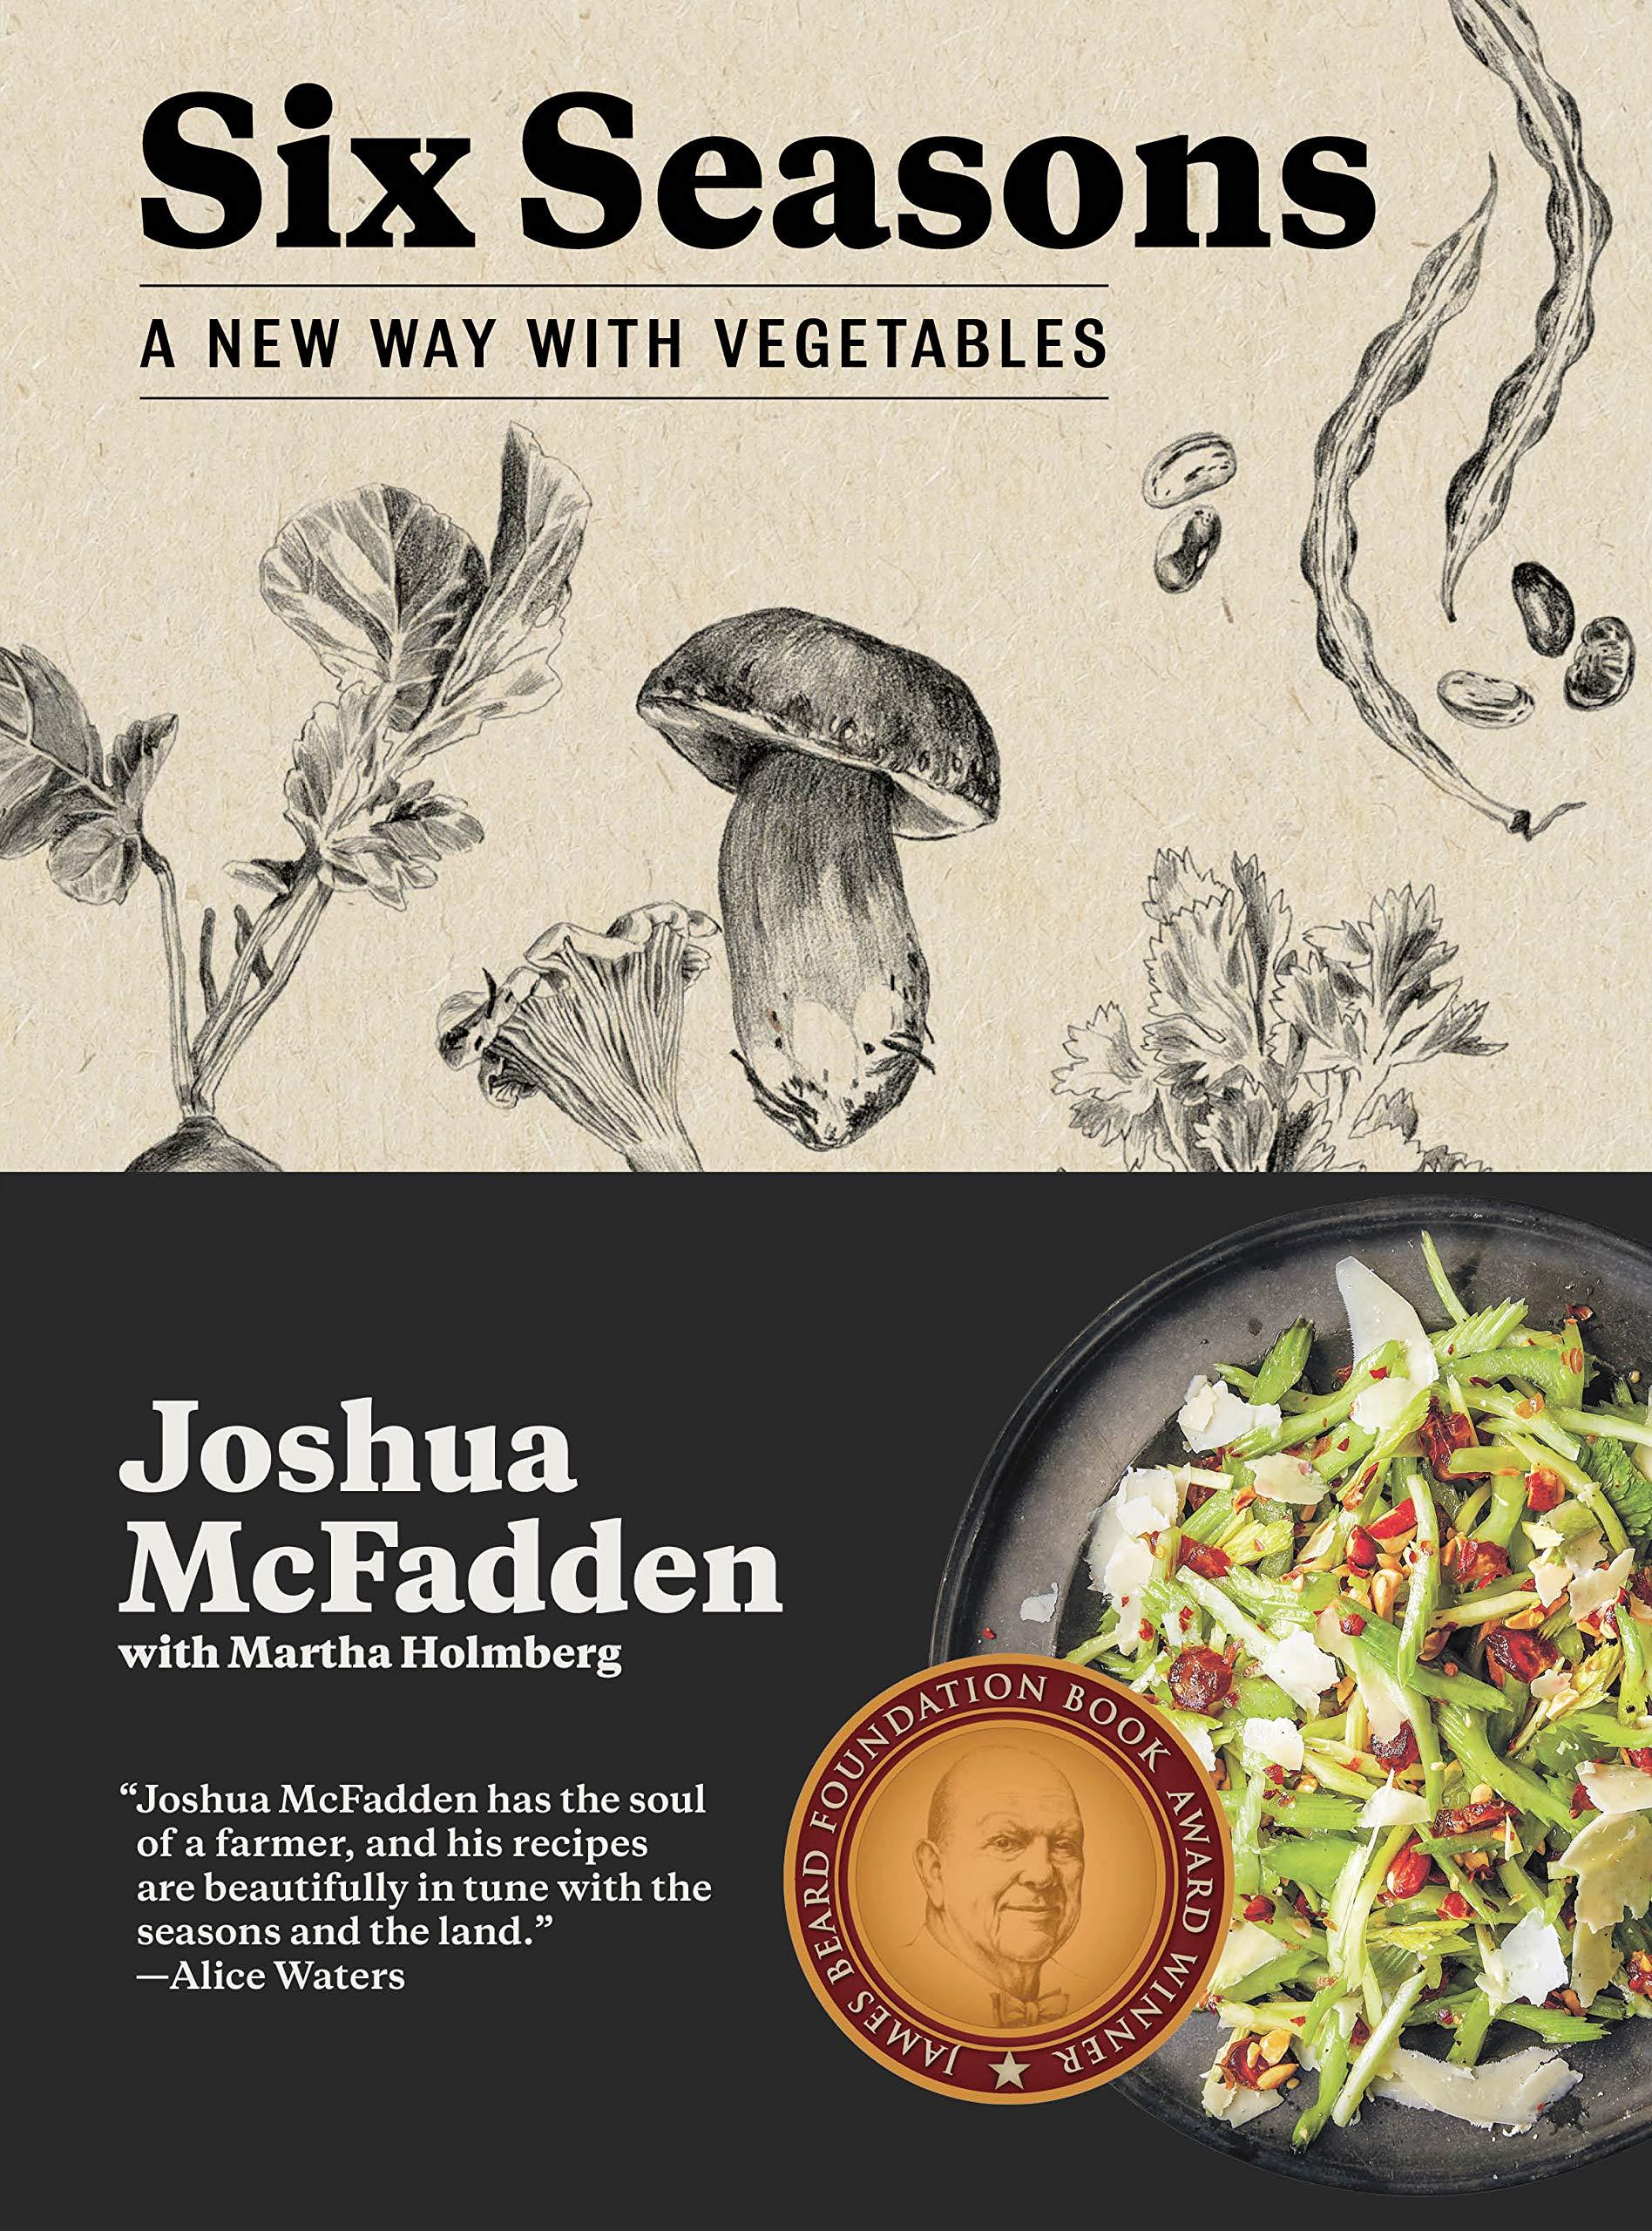 Six Seasons: A New Way with Vegetables: Joshua McFadden, Martha